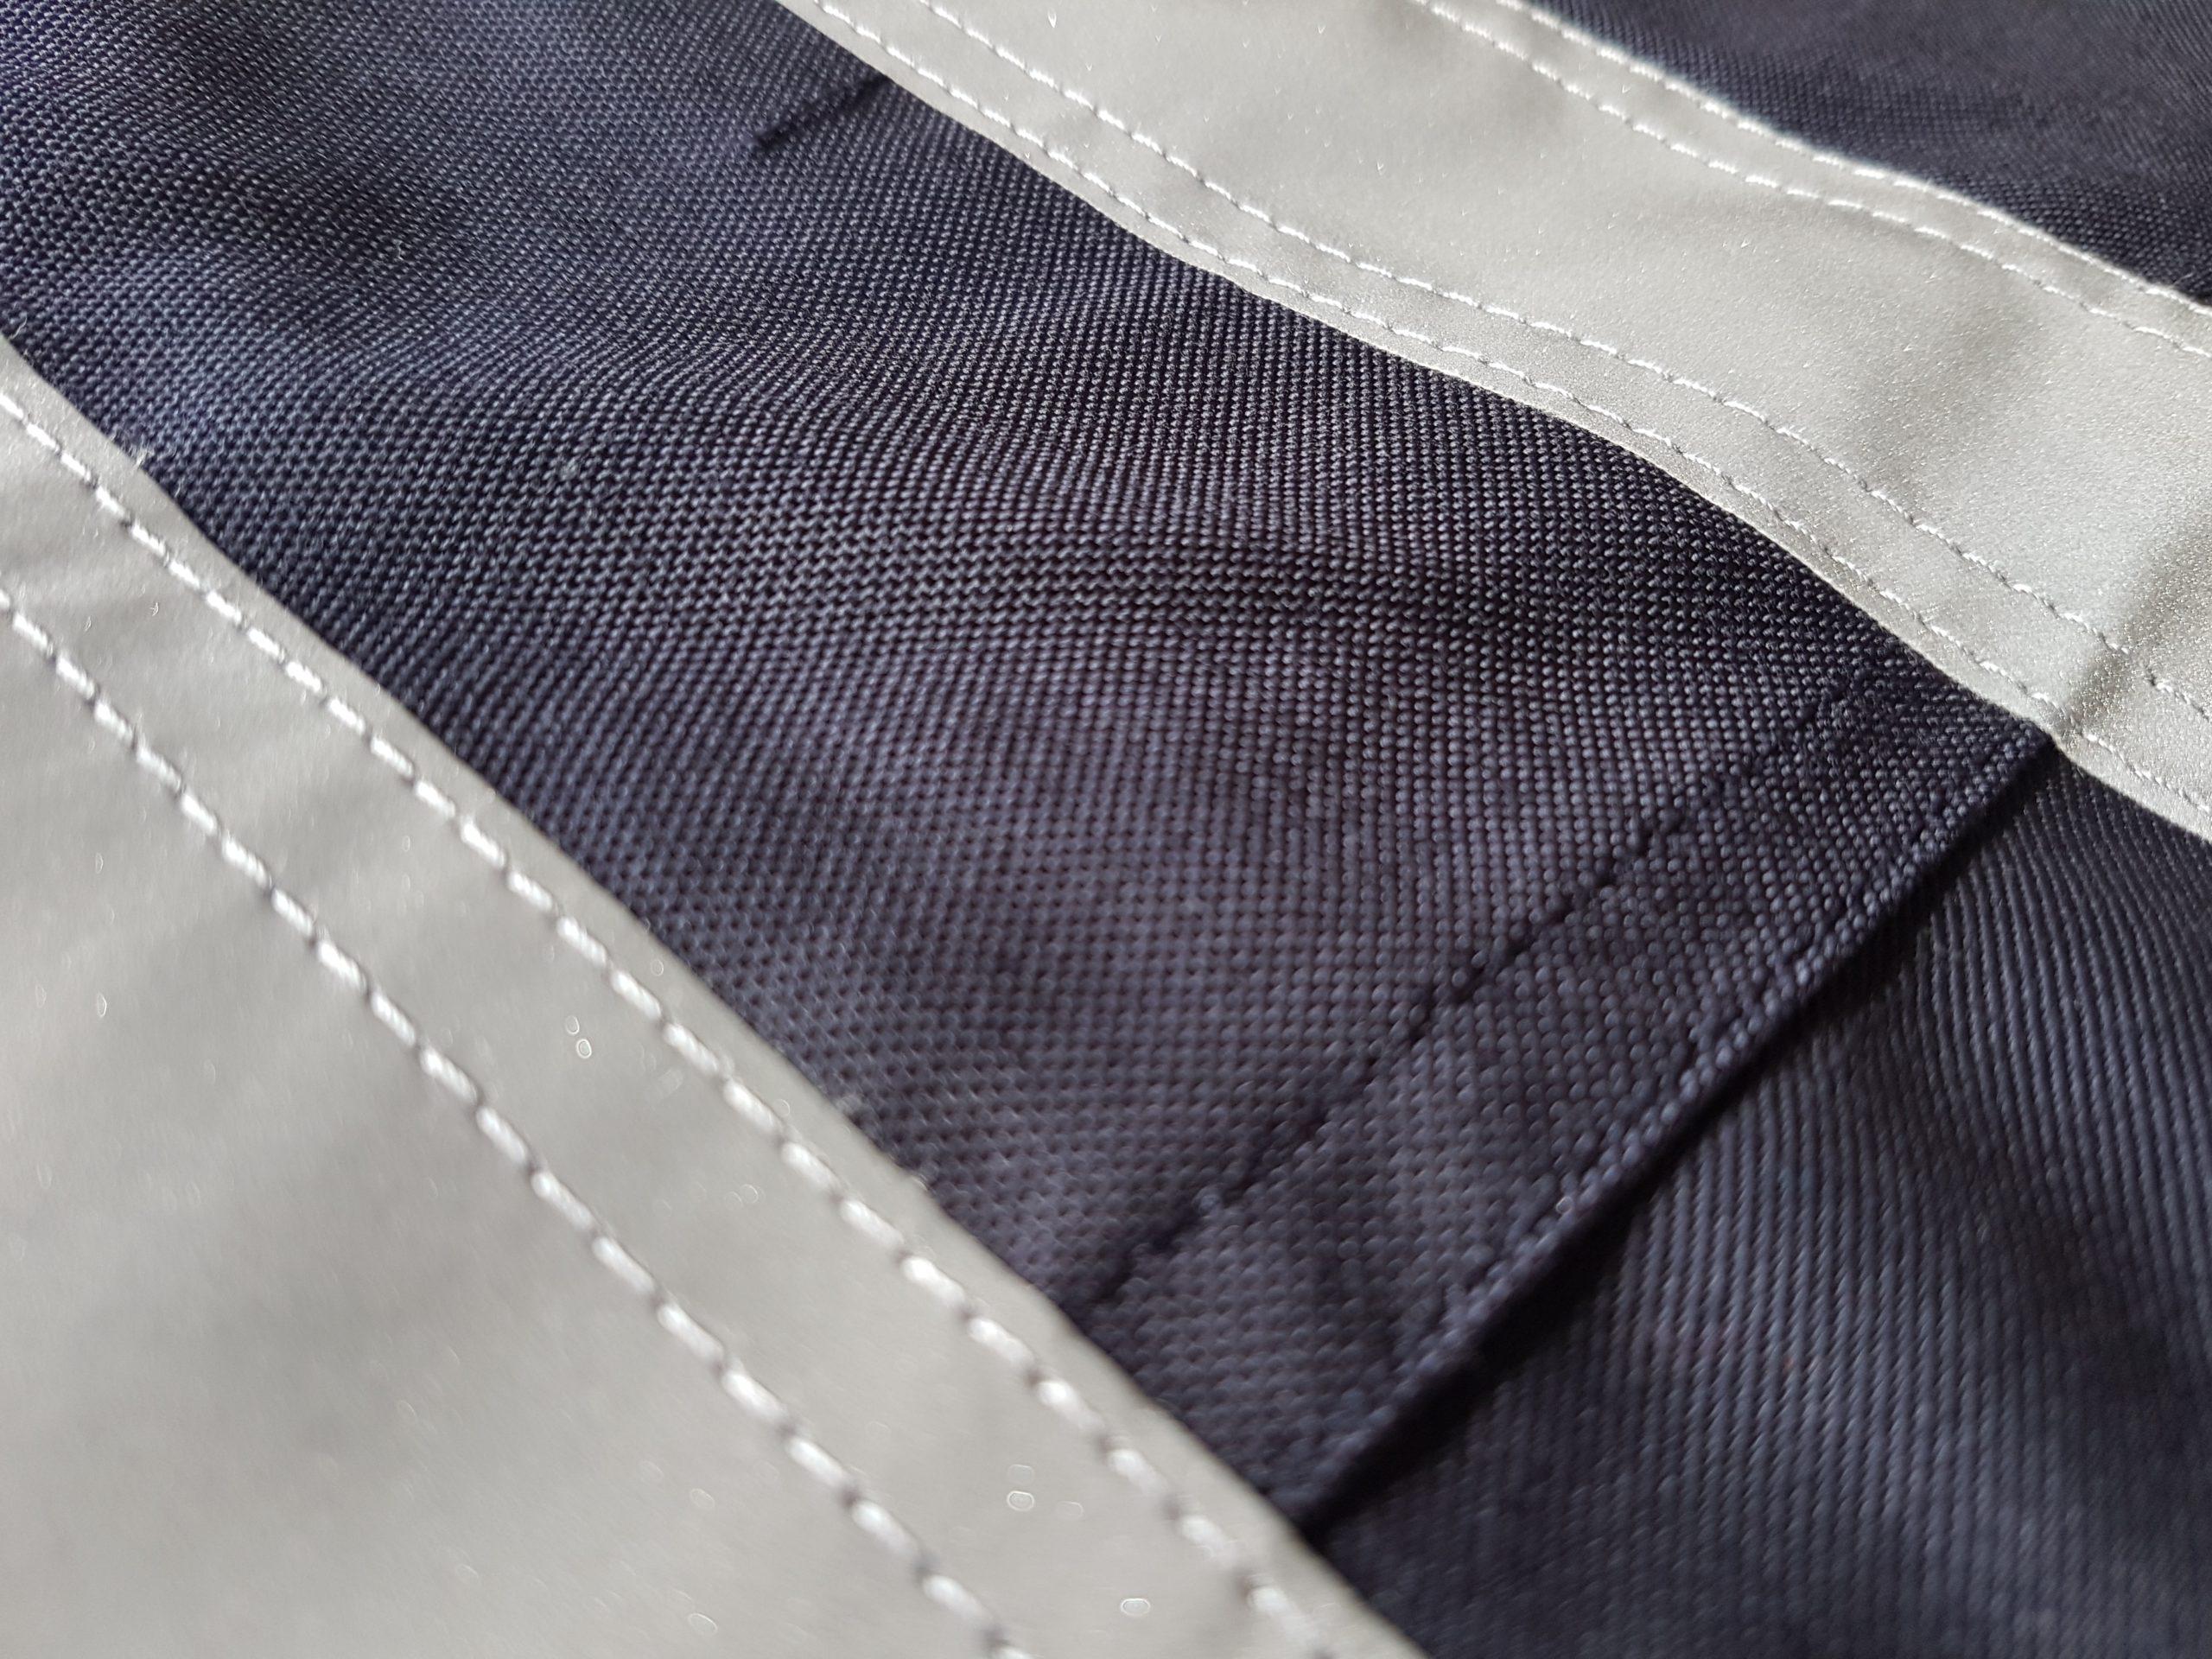 TR8143 Trouser CORDURA Fabric